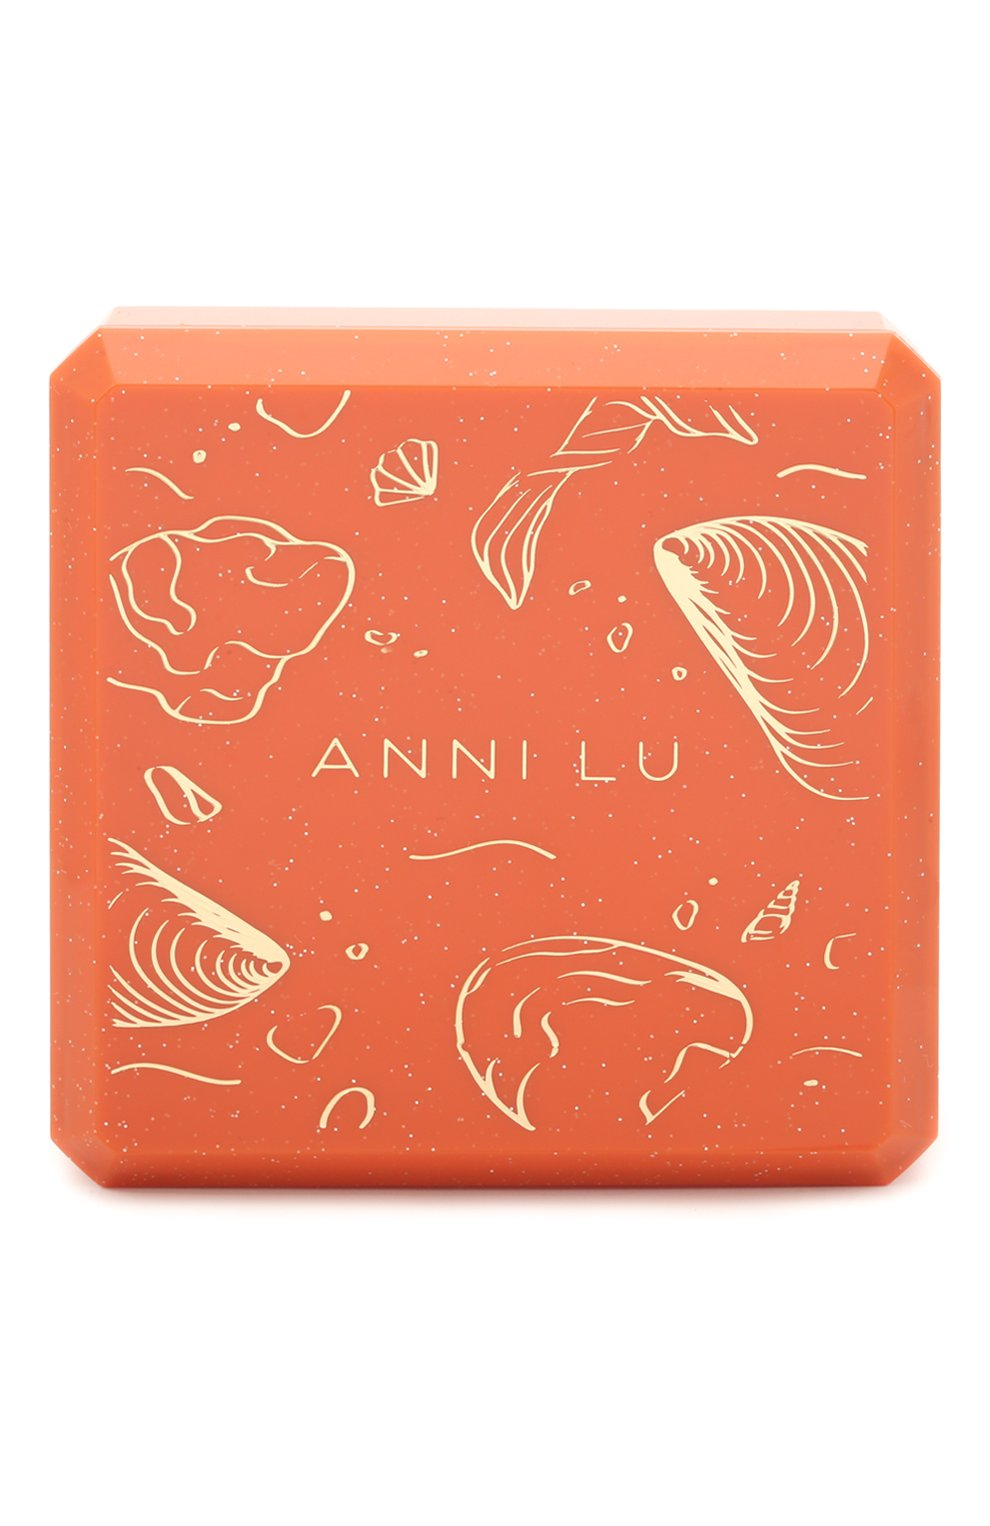 Женское колье ANNI LU розового цвета, арт. 201-20-52   Фото 4 (Материал: Металл)